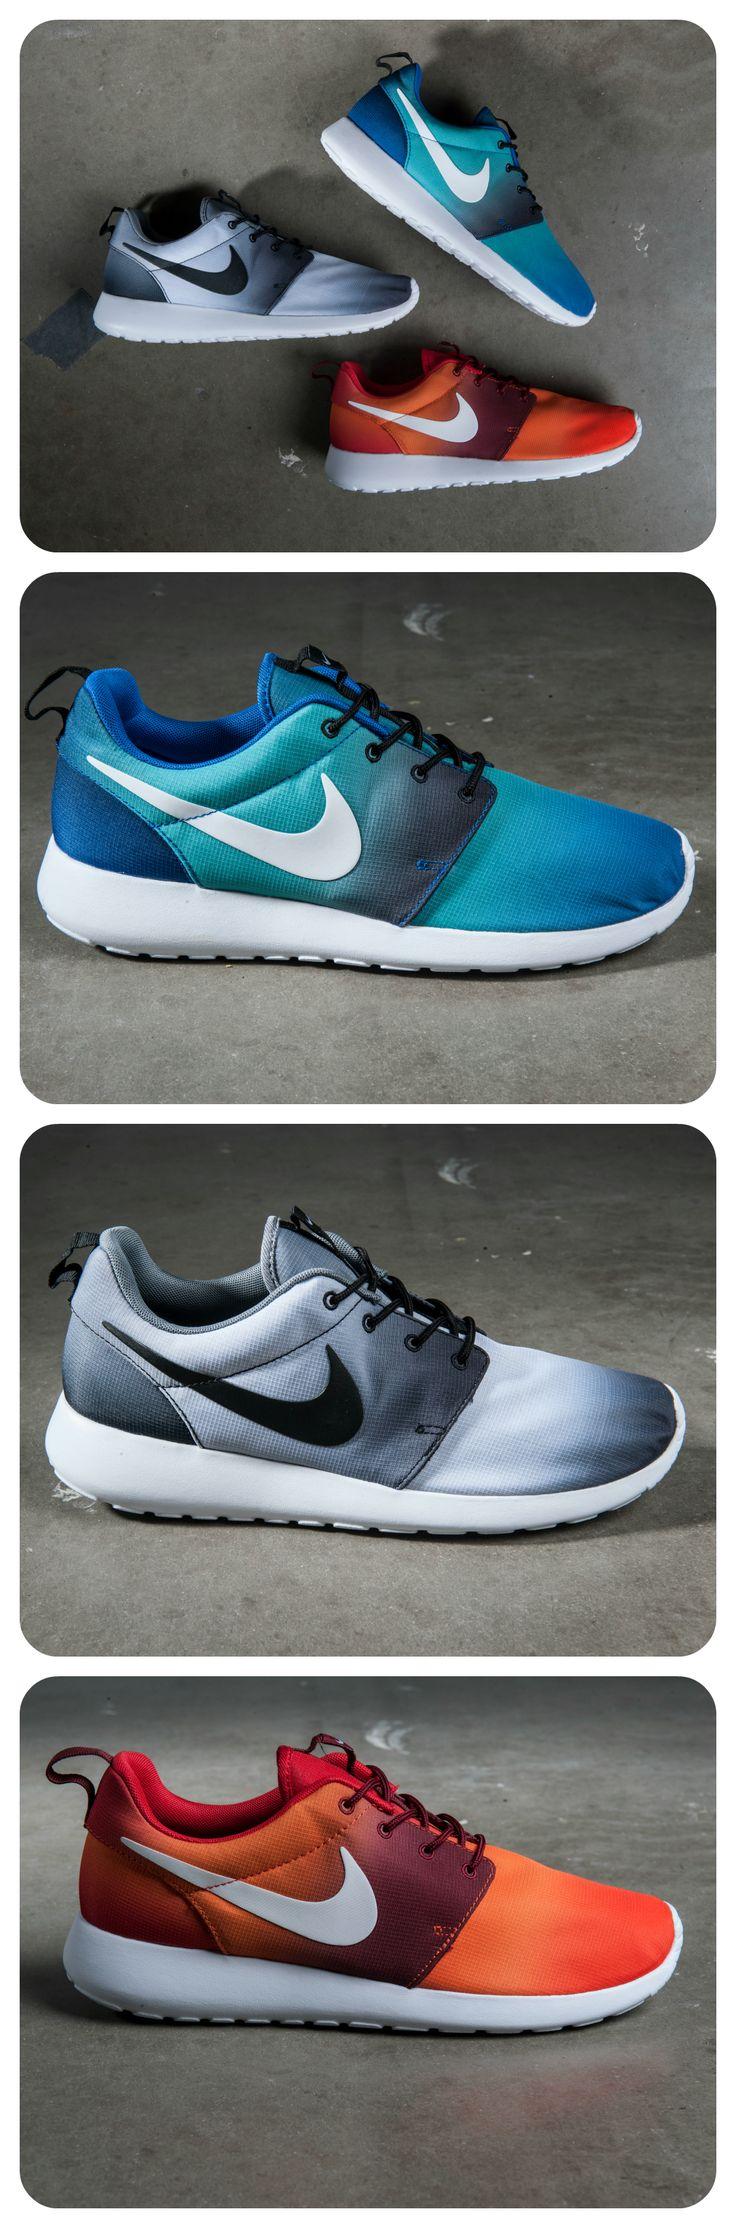 Attention please! New Nike Roshes have just arrived. Don't miss 'em. #RosheOne